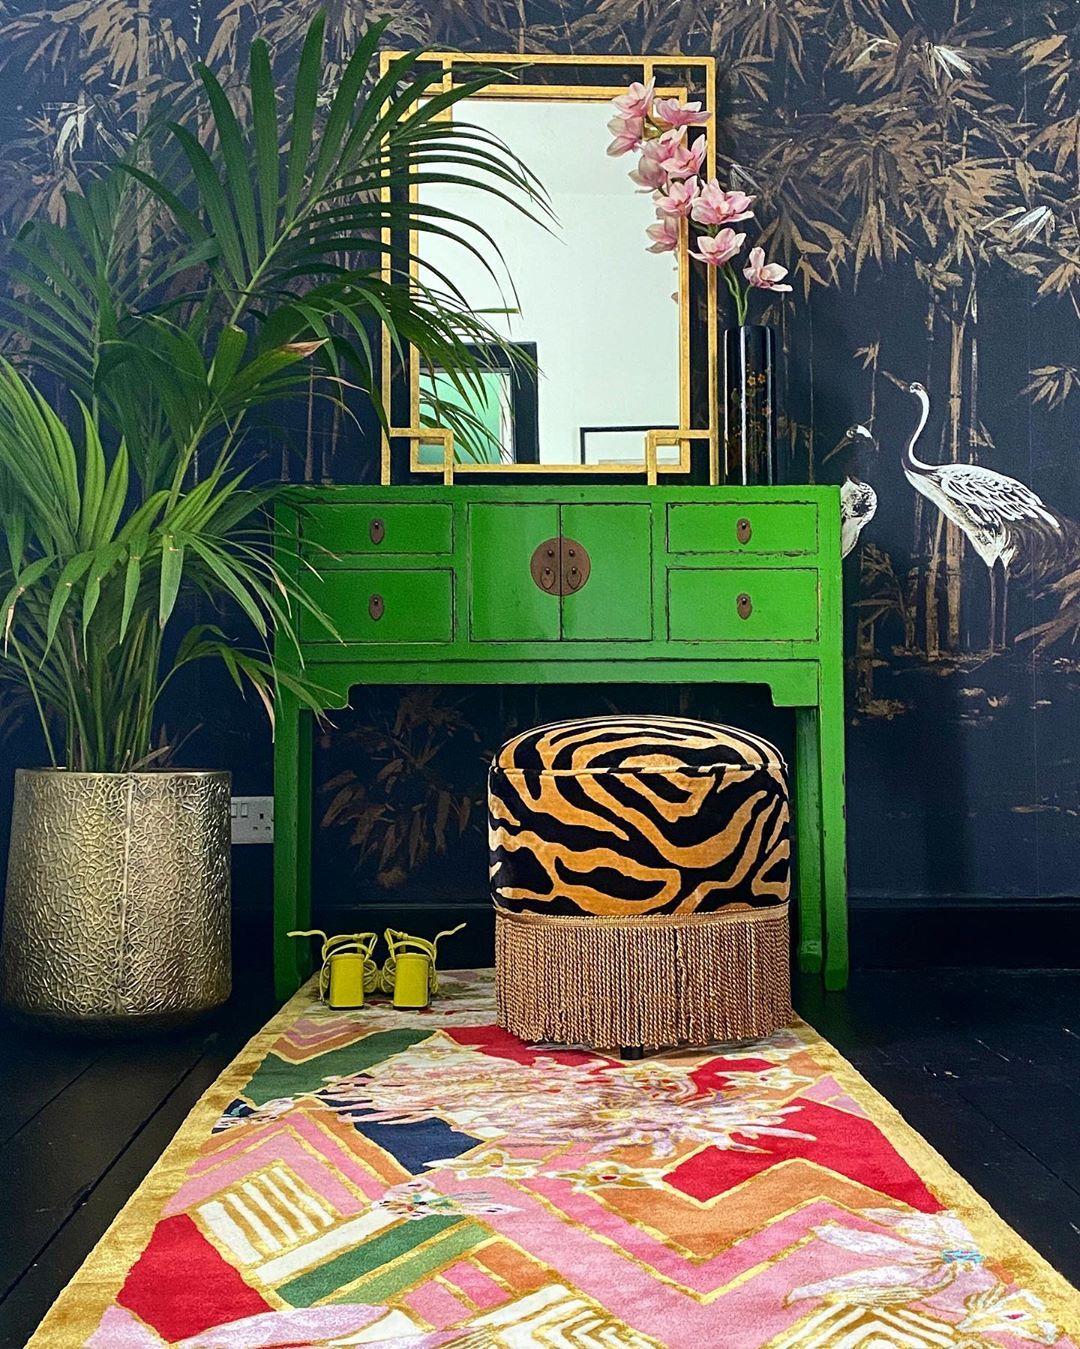 Shanghai Blossom Wendy Morrison Design In 2020 Colorful Decor Chinoiserie Wallpaper Dream Decor